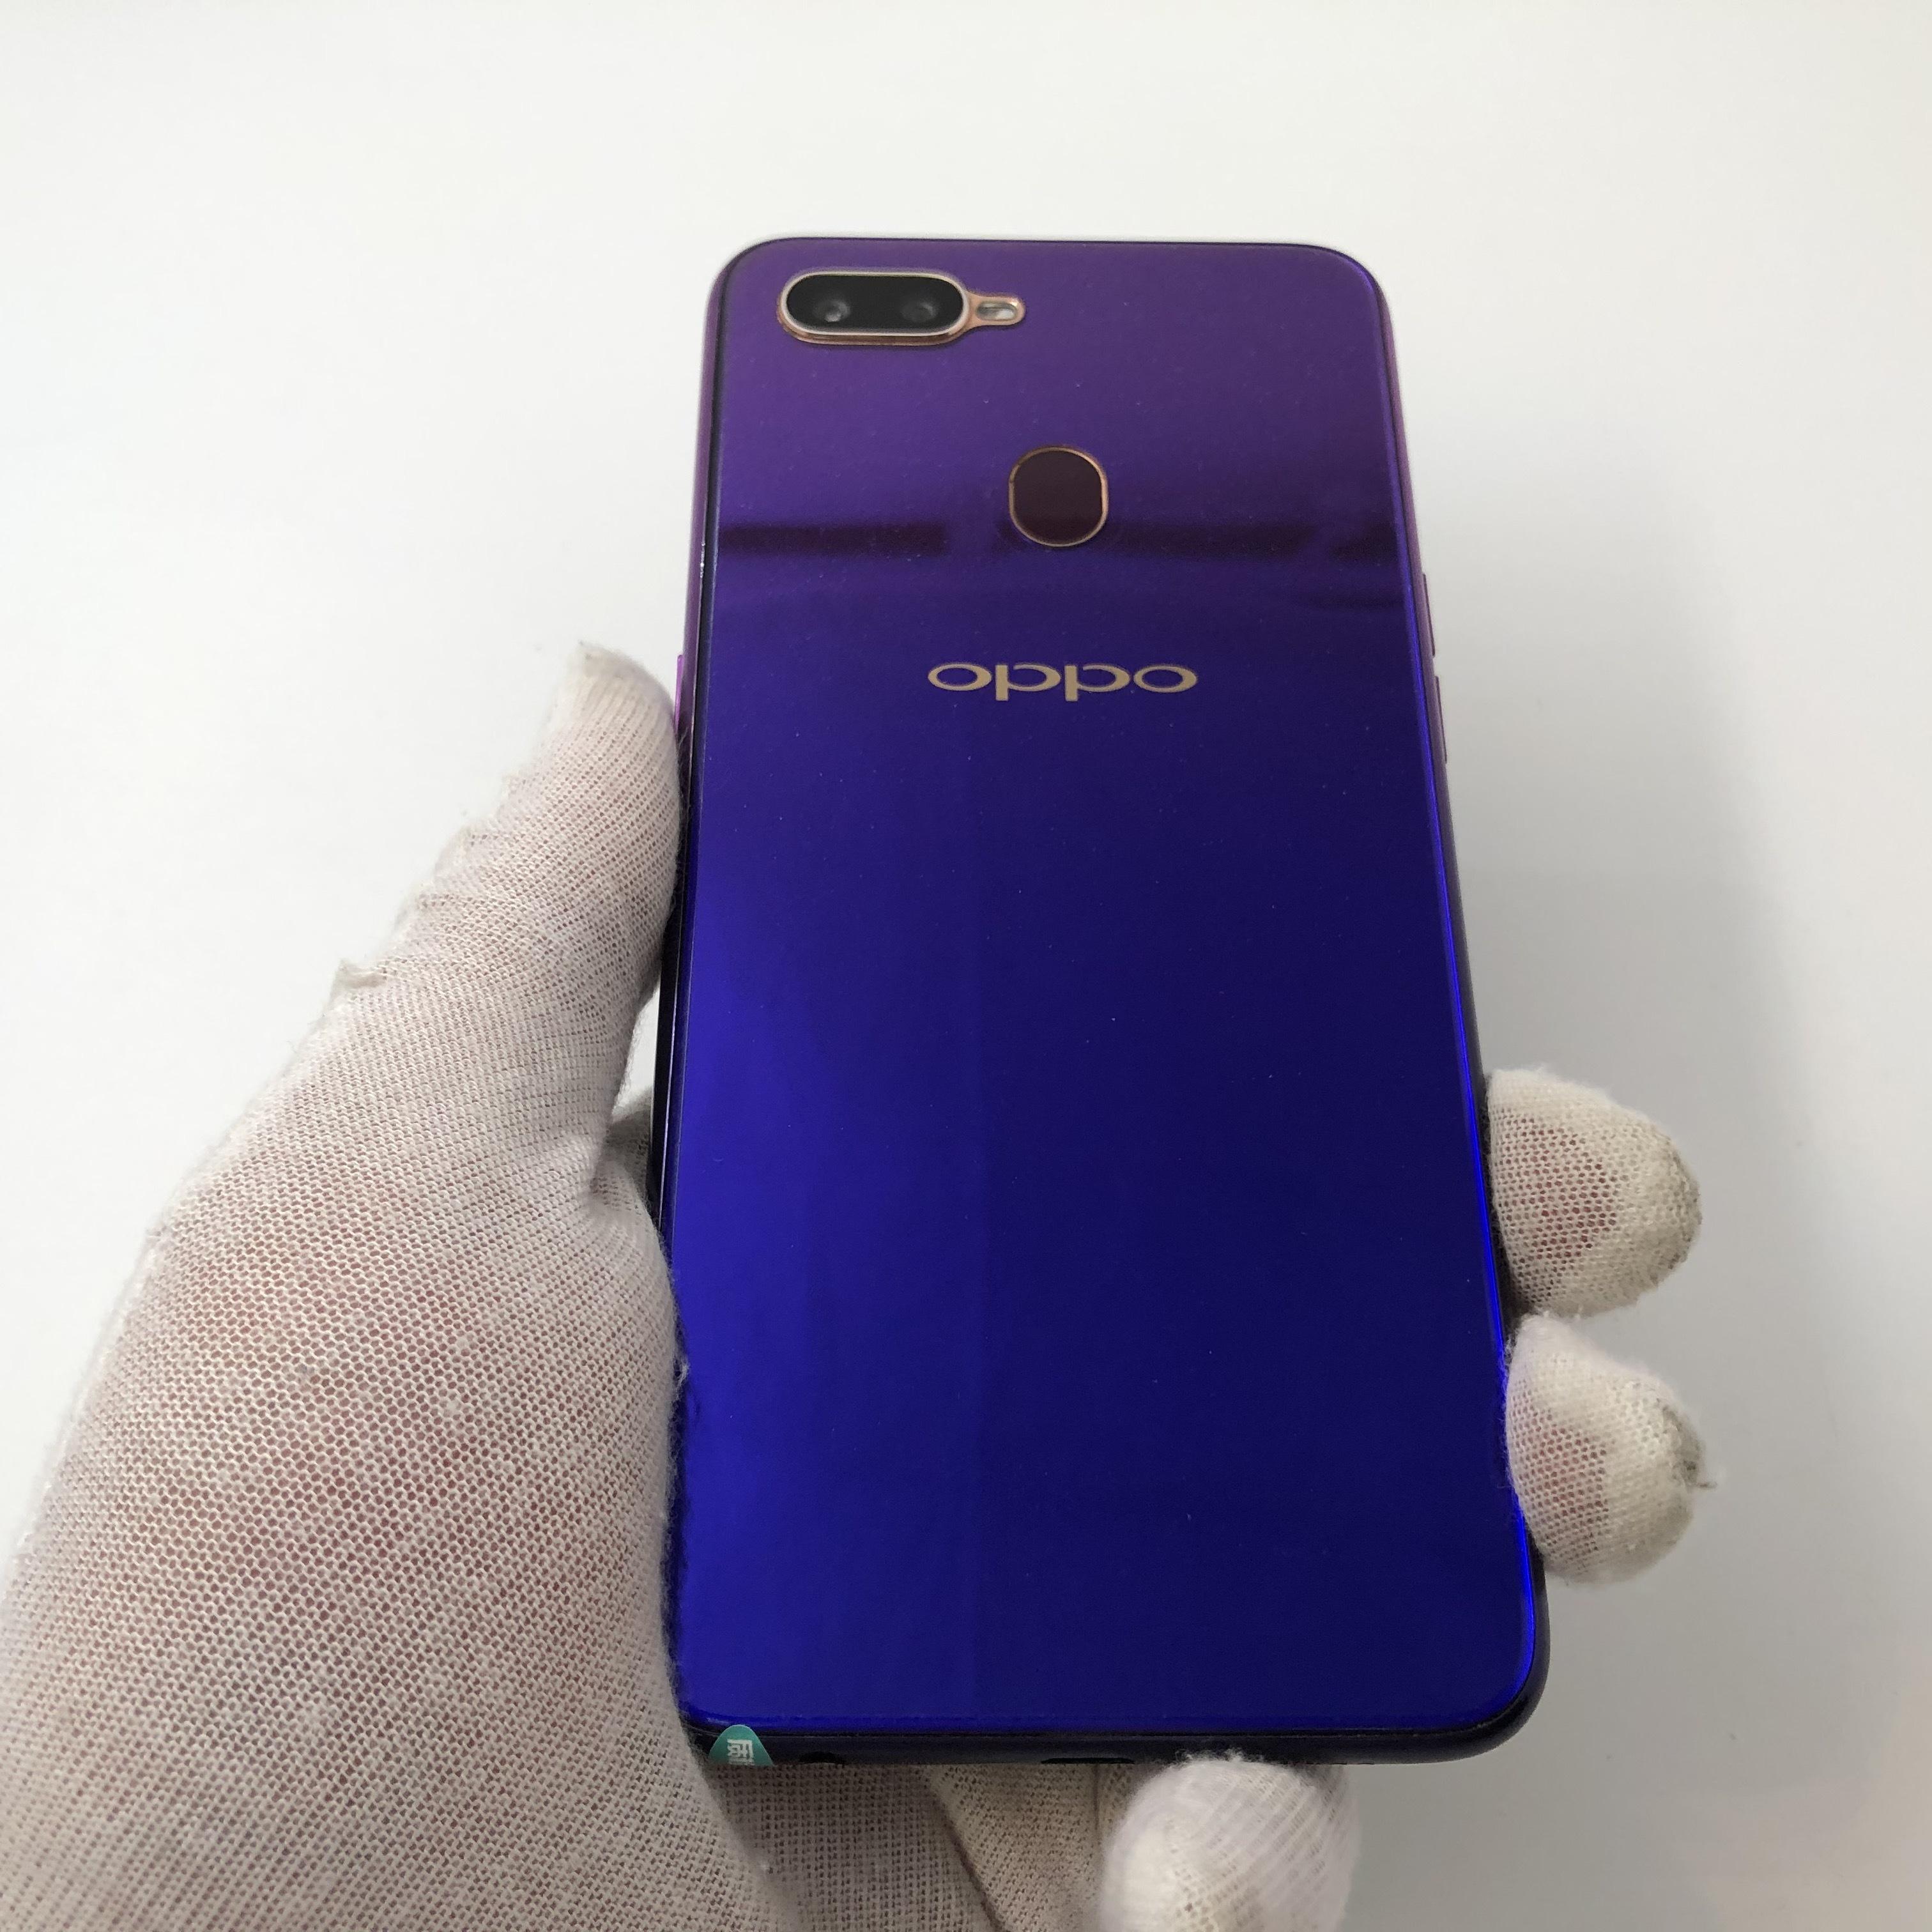 oppo【A7x】全网通 紫色 4G/128G 国行 8成新